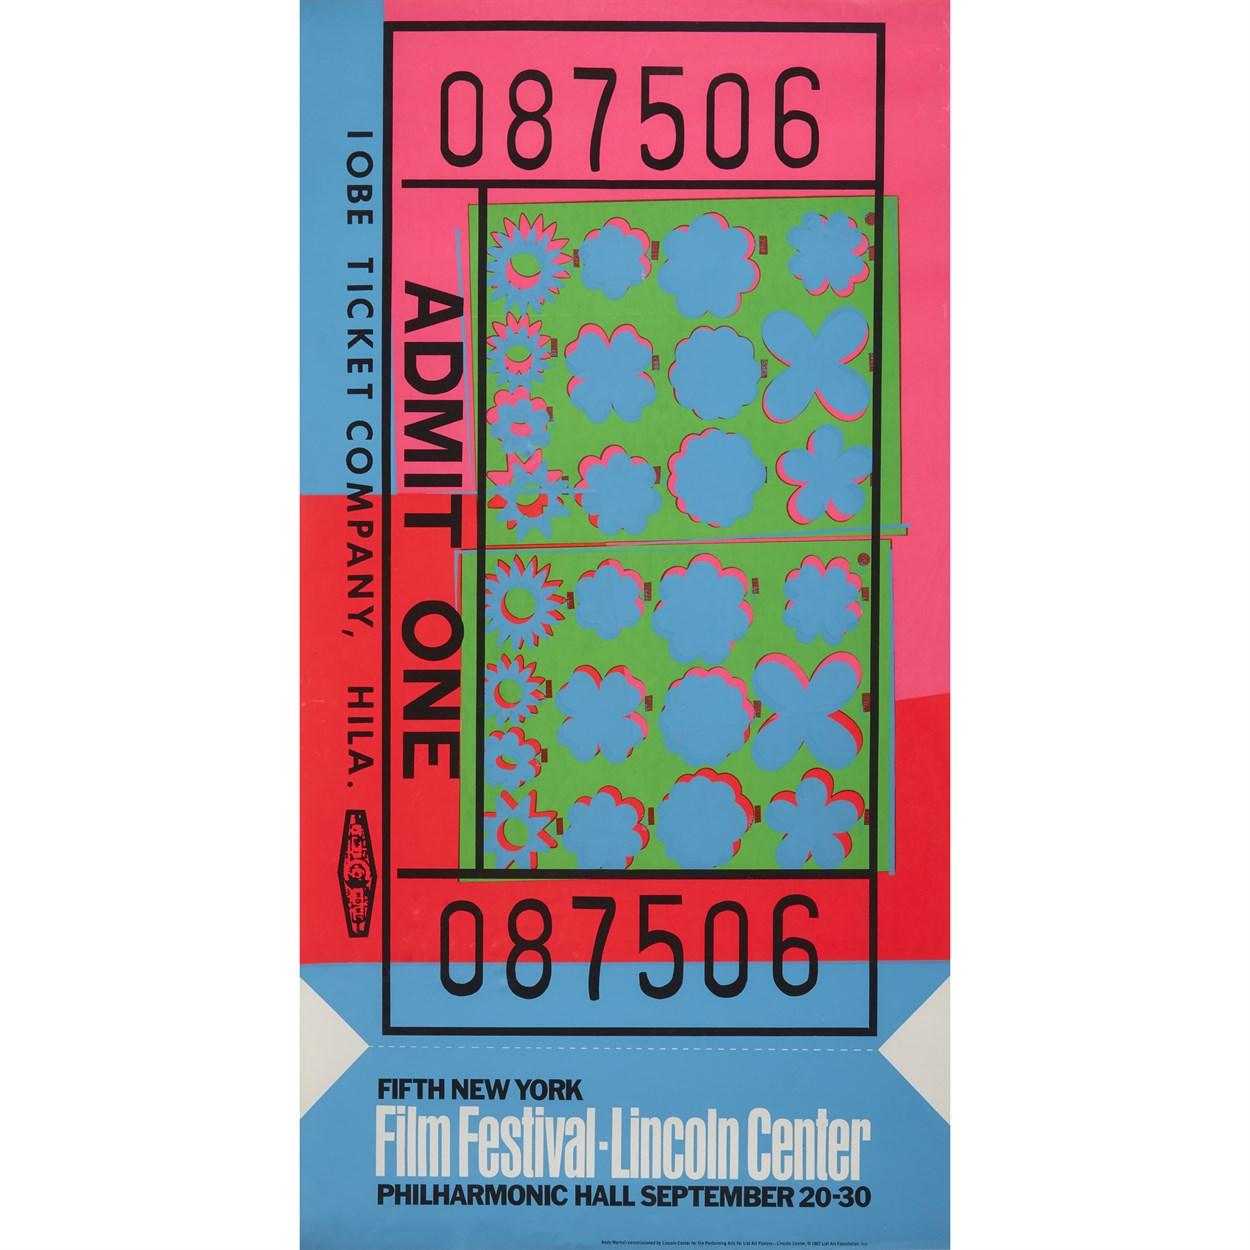 Lot 71 - Andy Warhol (American, 1928-1987)